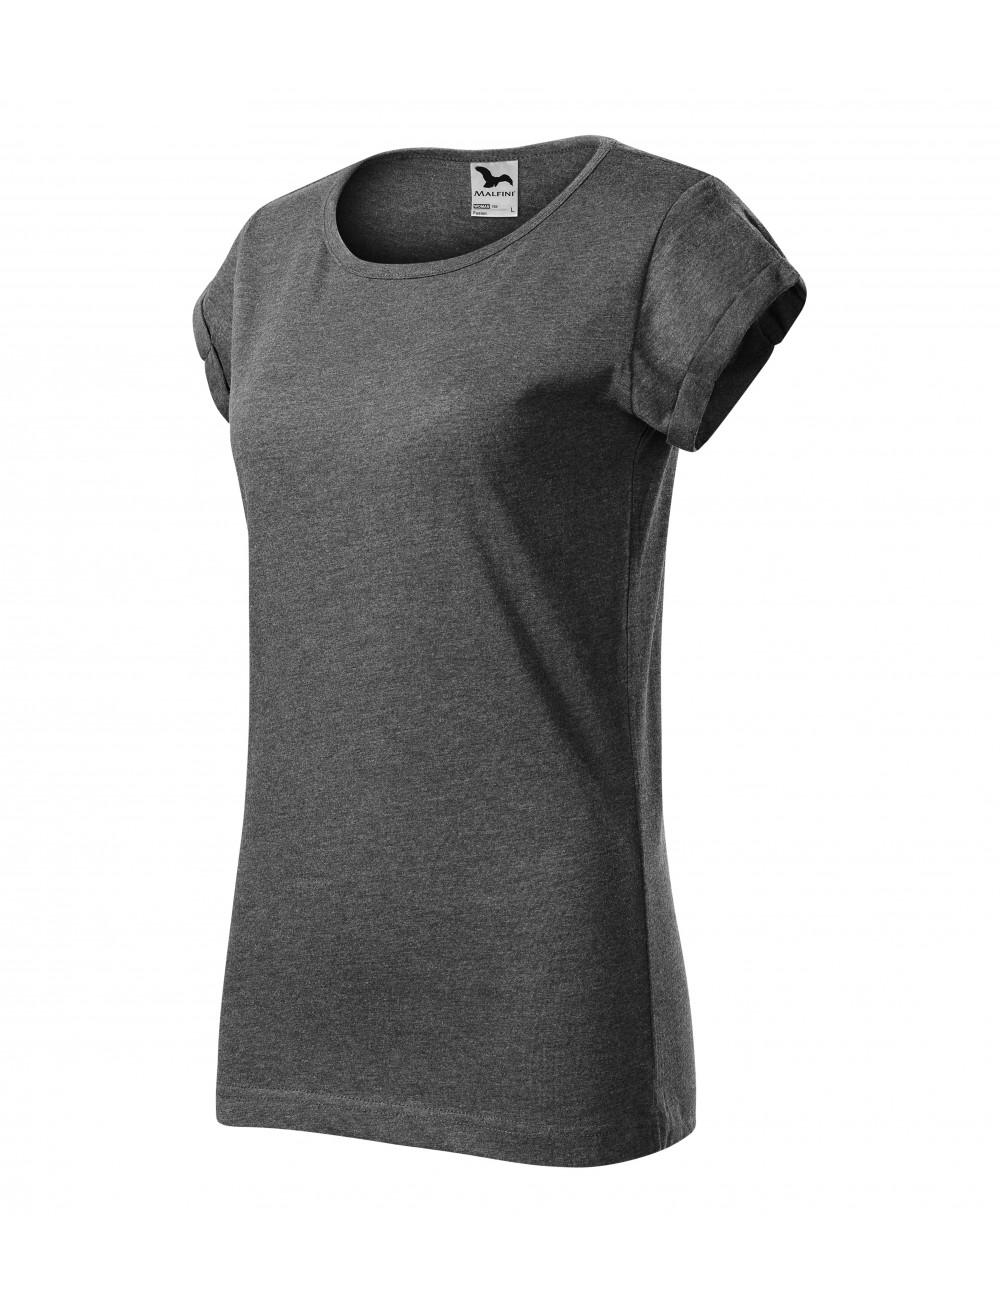 Adler MALFINI Koszulka damska Fusion 164 czarny melanż